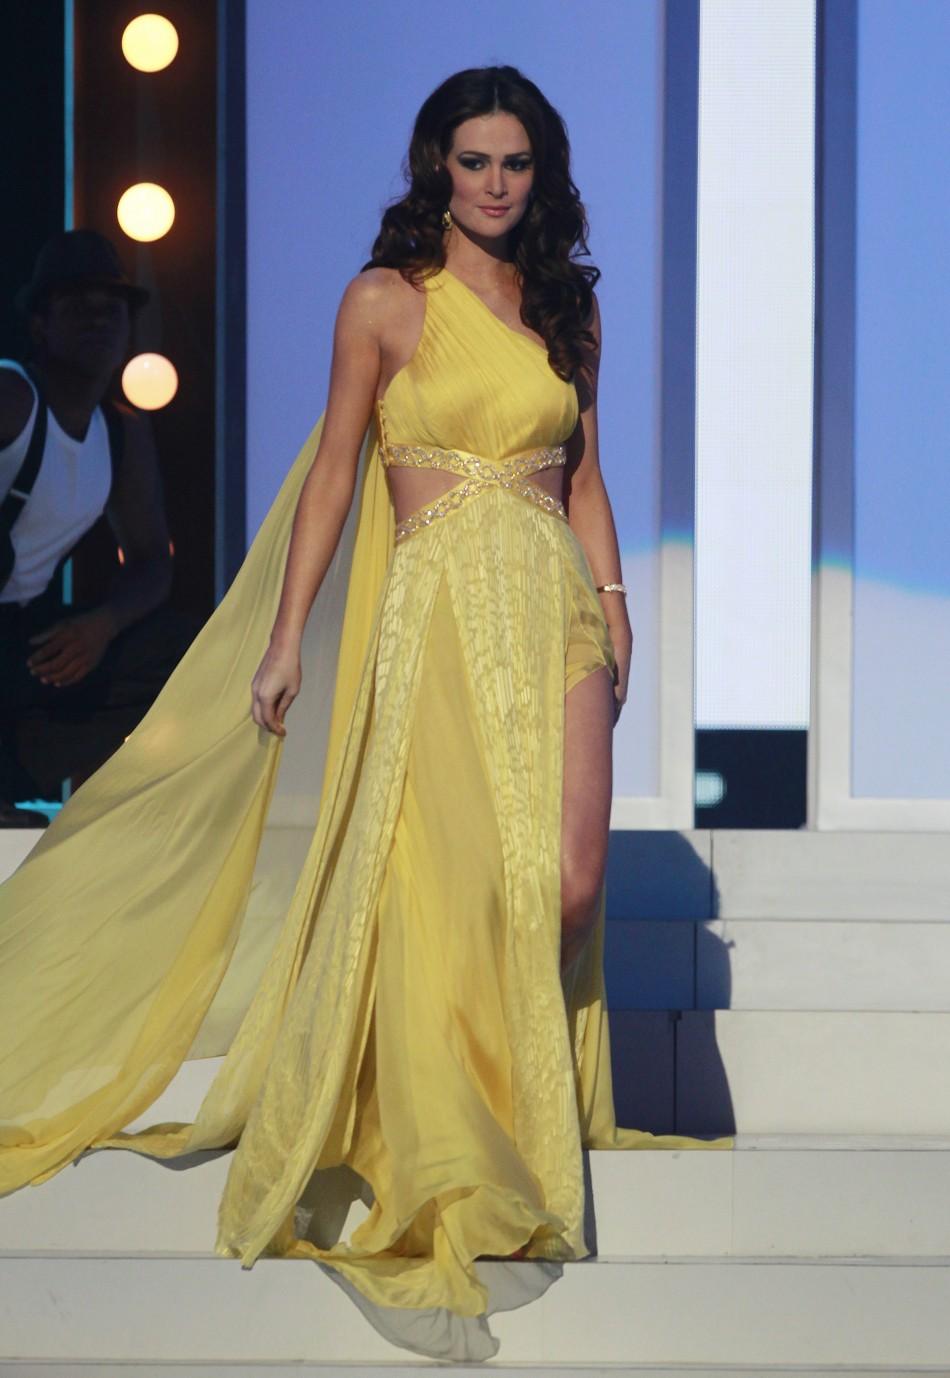 Miss Brazil Priscila Machado participates in the evening gown segment of the Miss Universe 2011 pageant in Sao Paulo